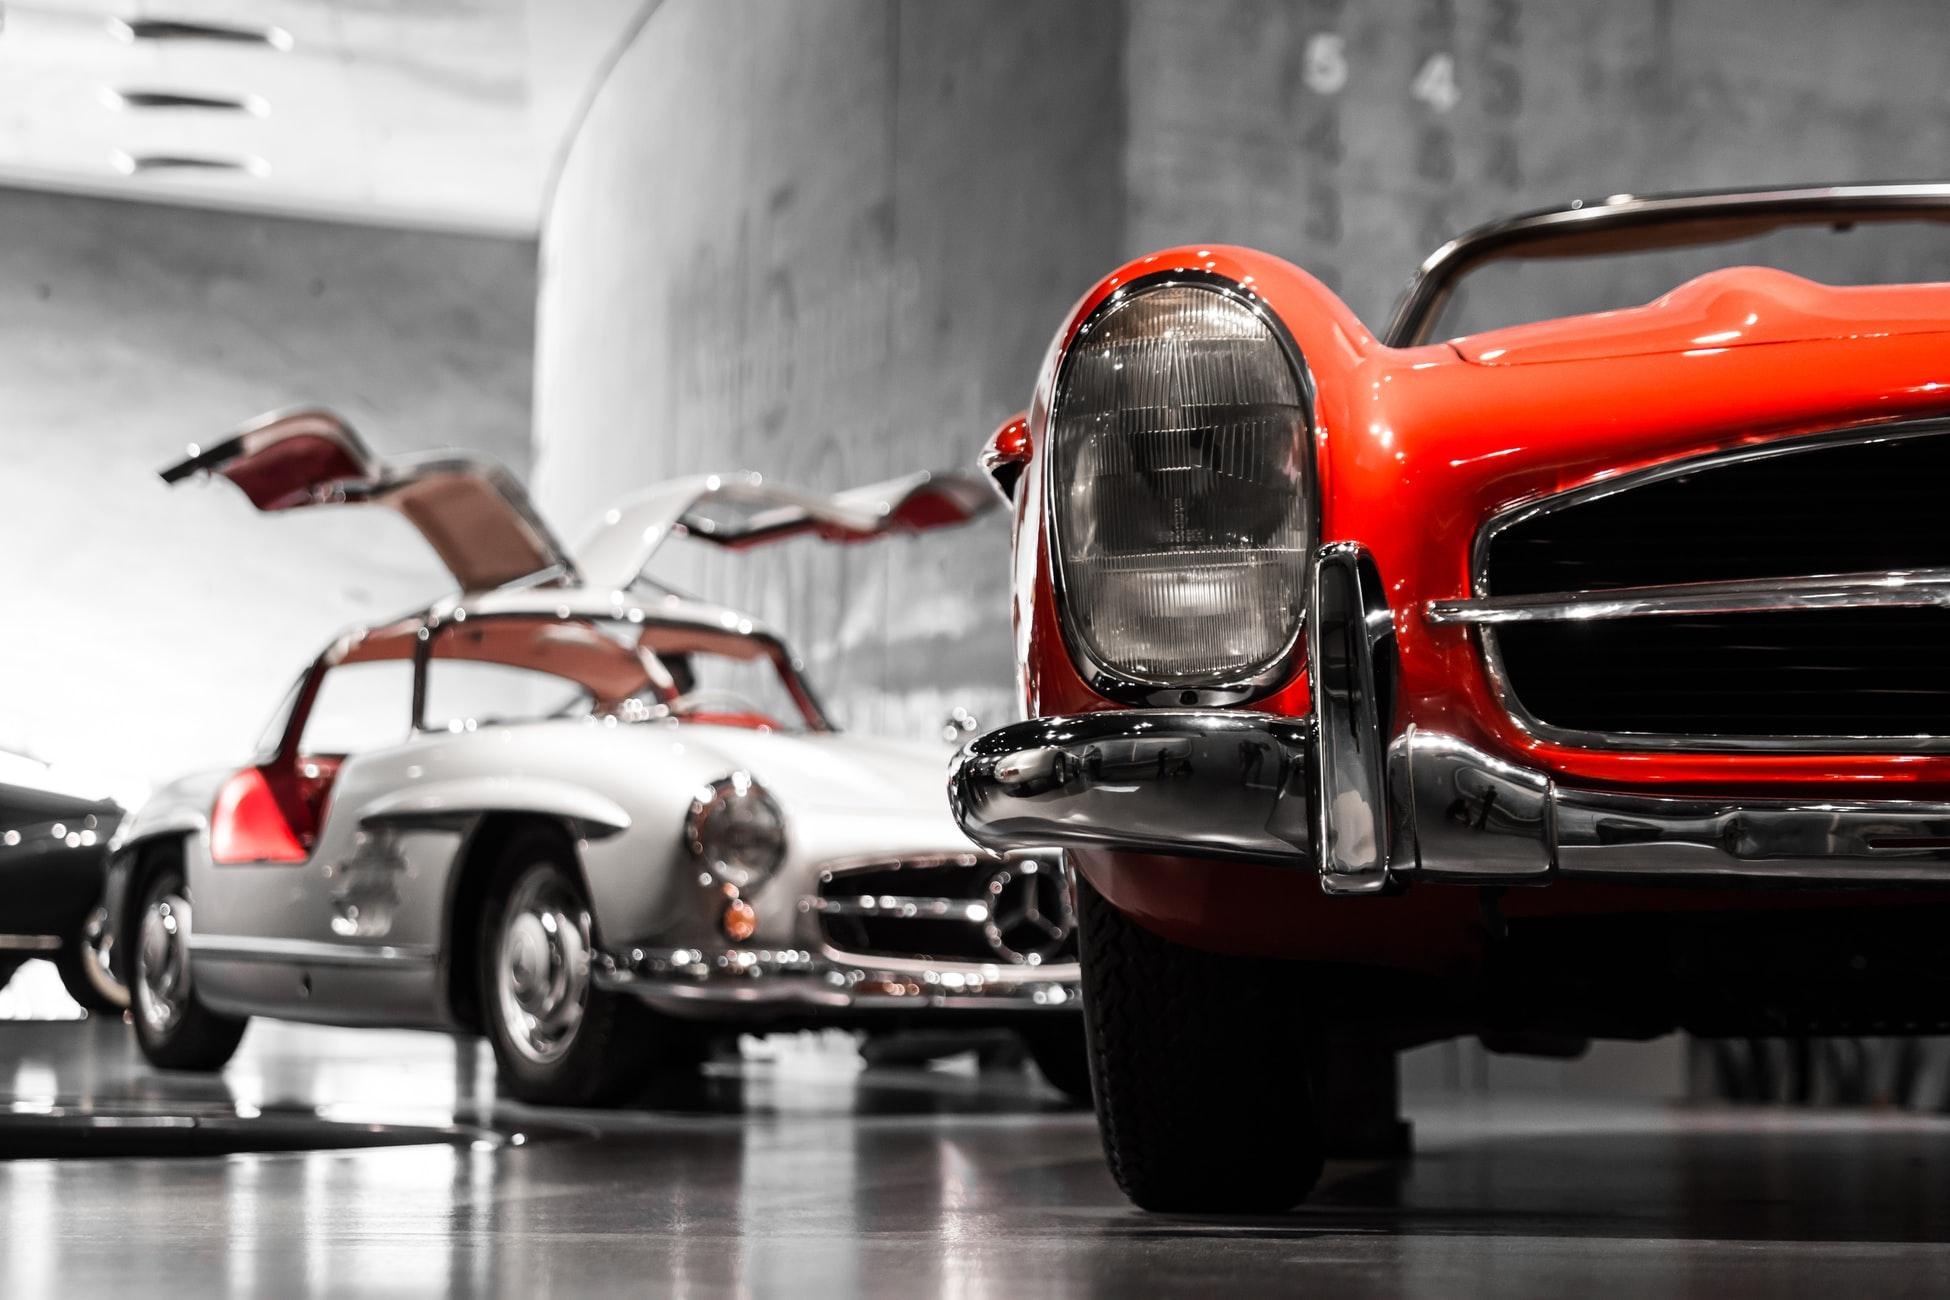 Musées à visiter en ligne - Musée Mercedes Benz Stuttgart